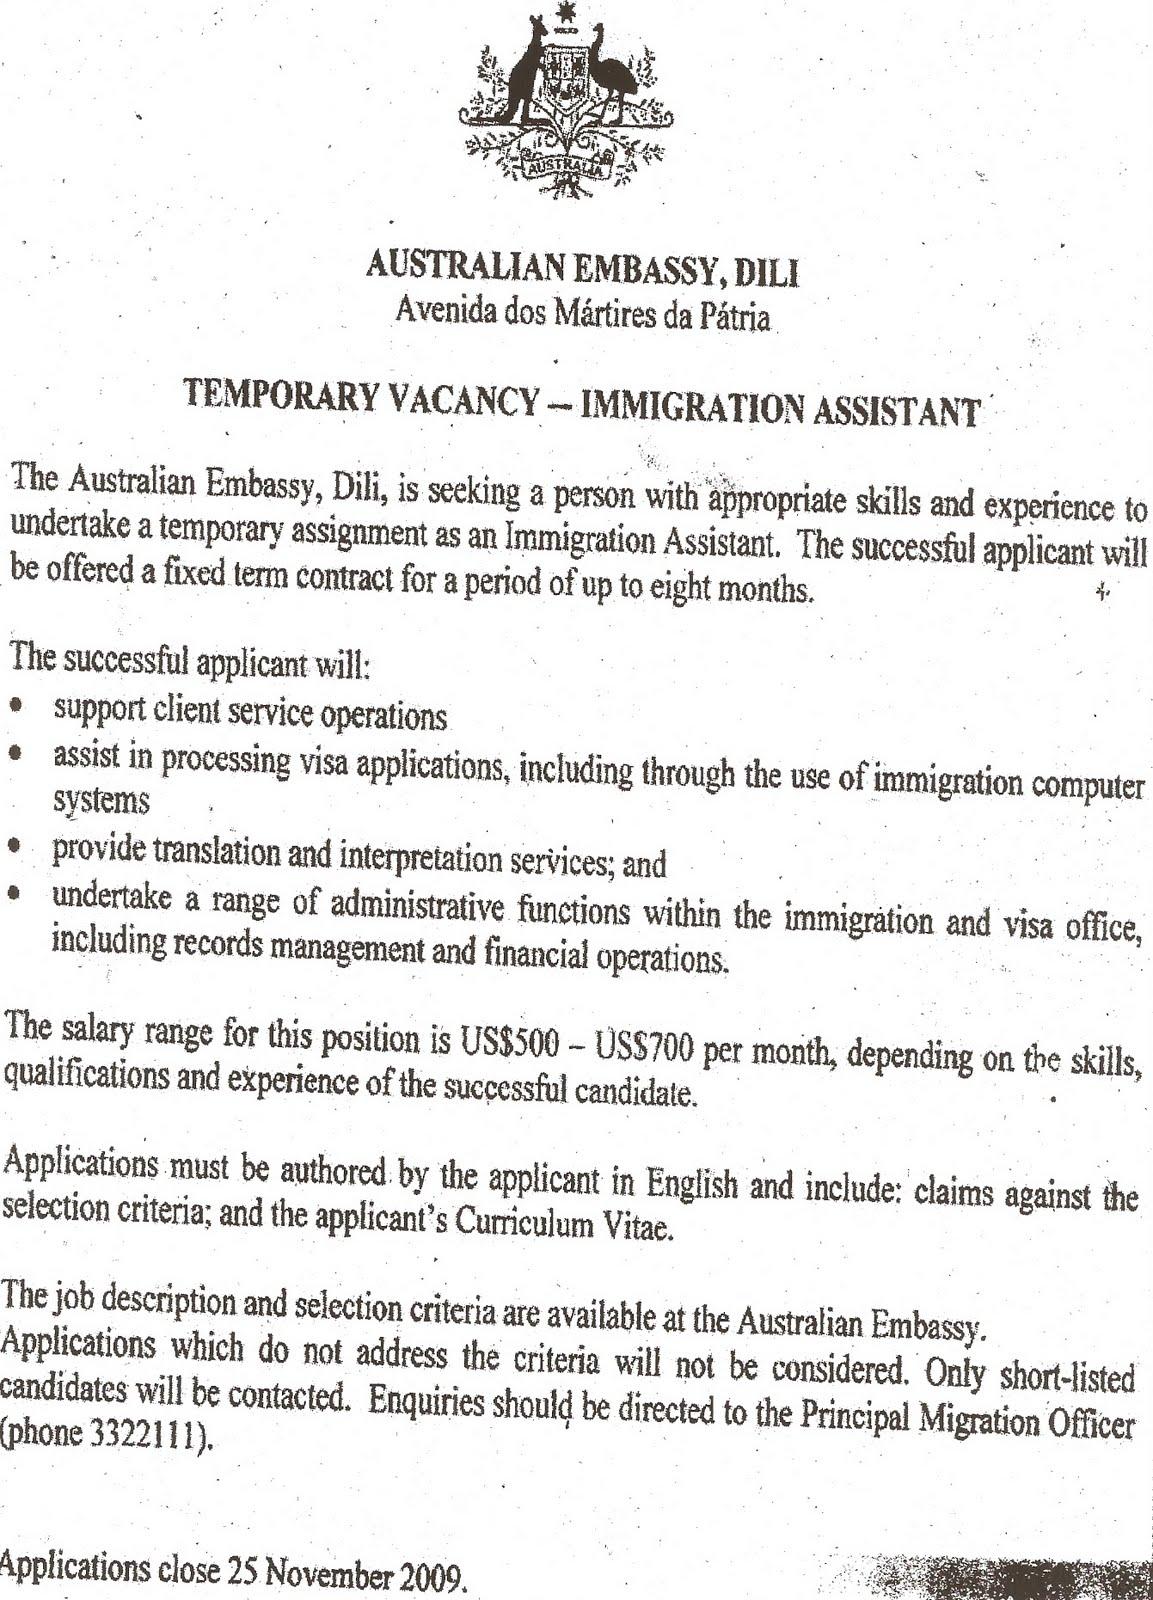 Cover letter for job application embassy